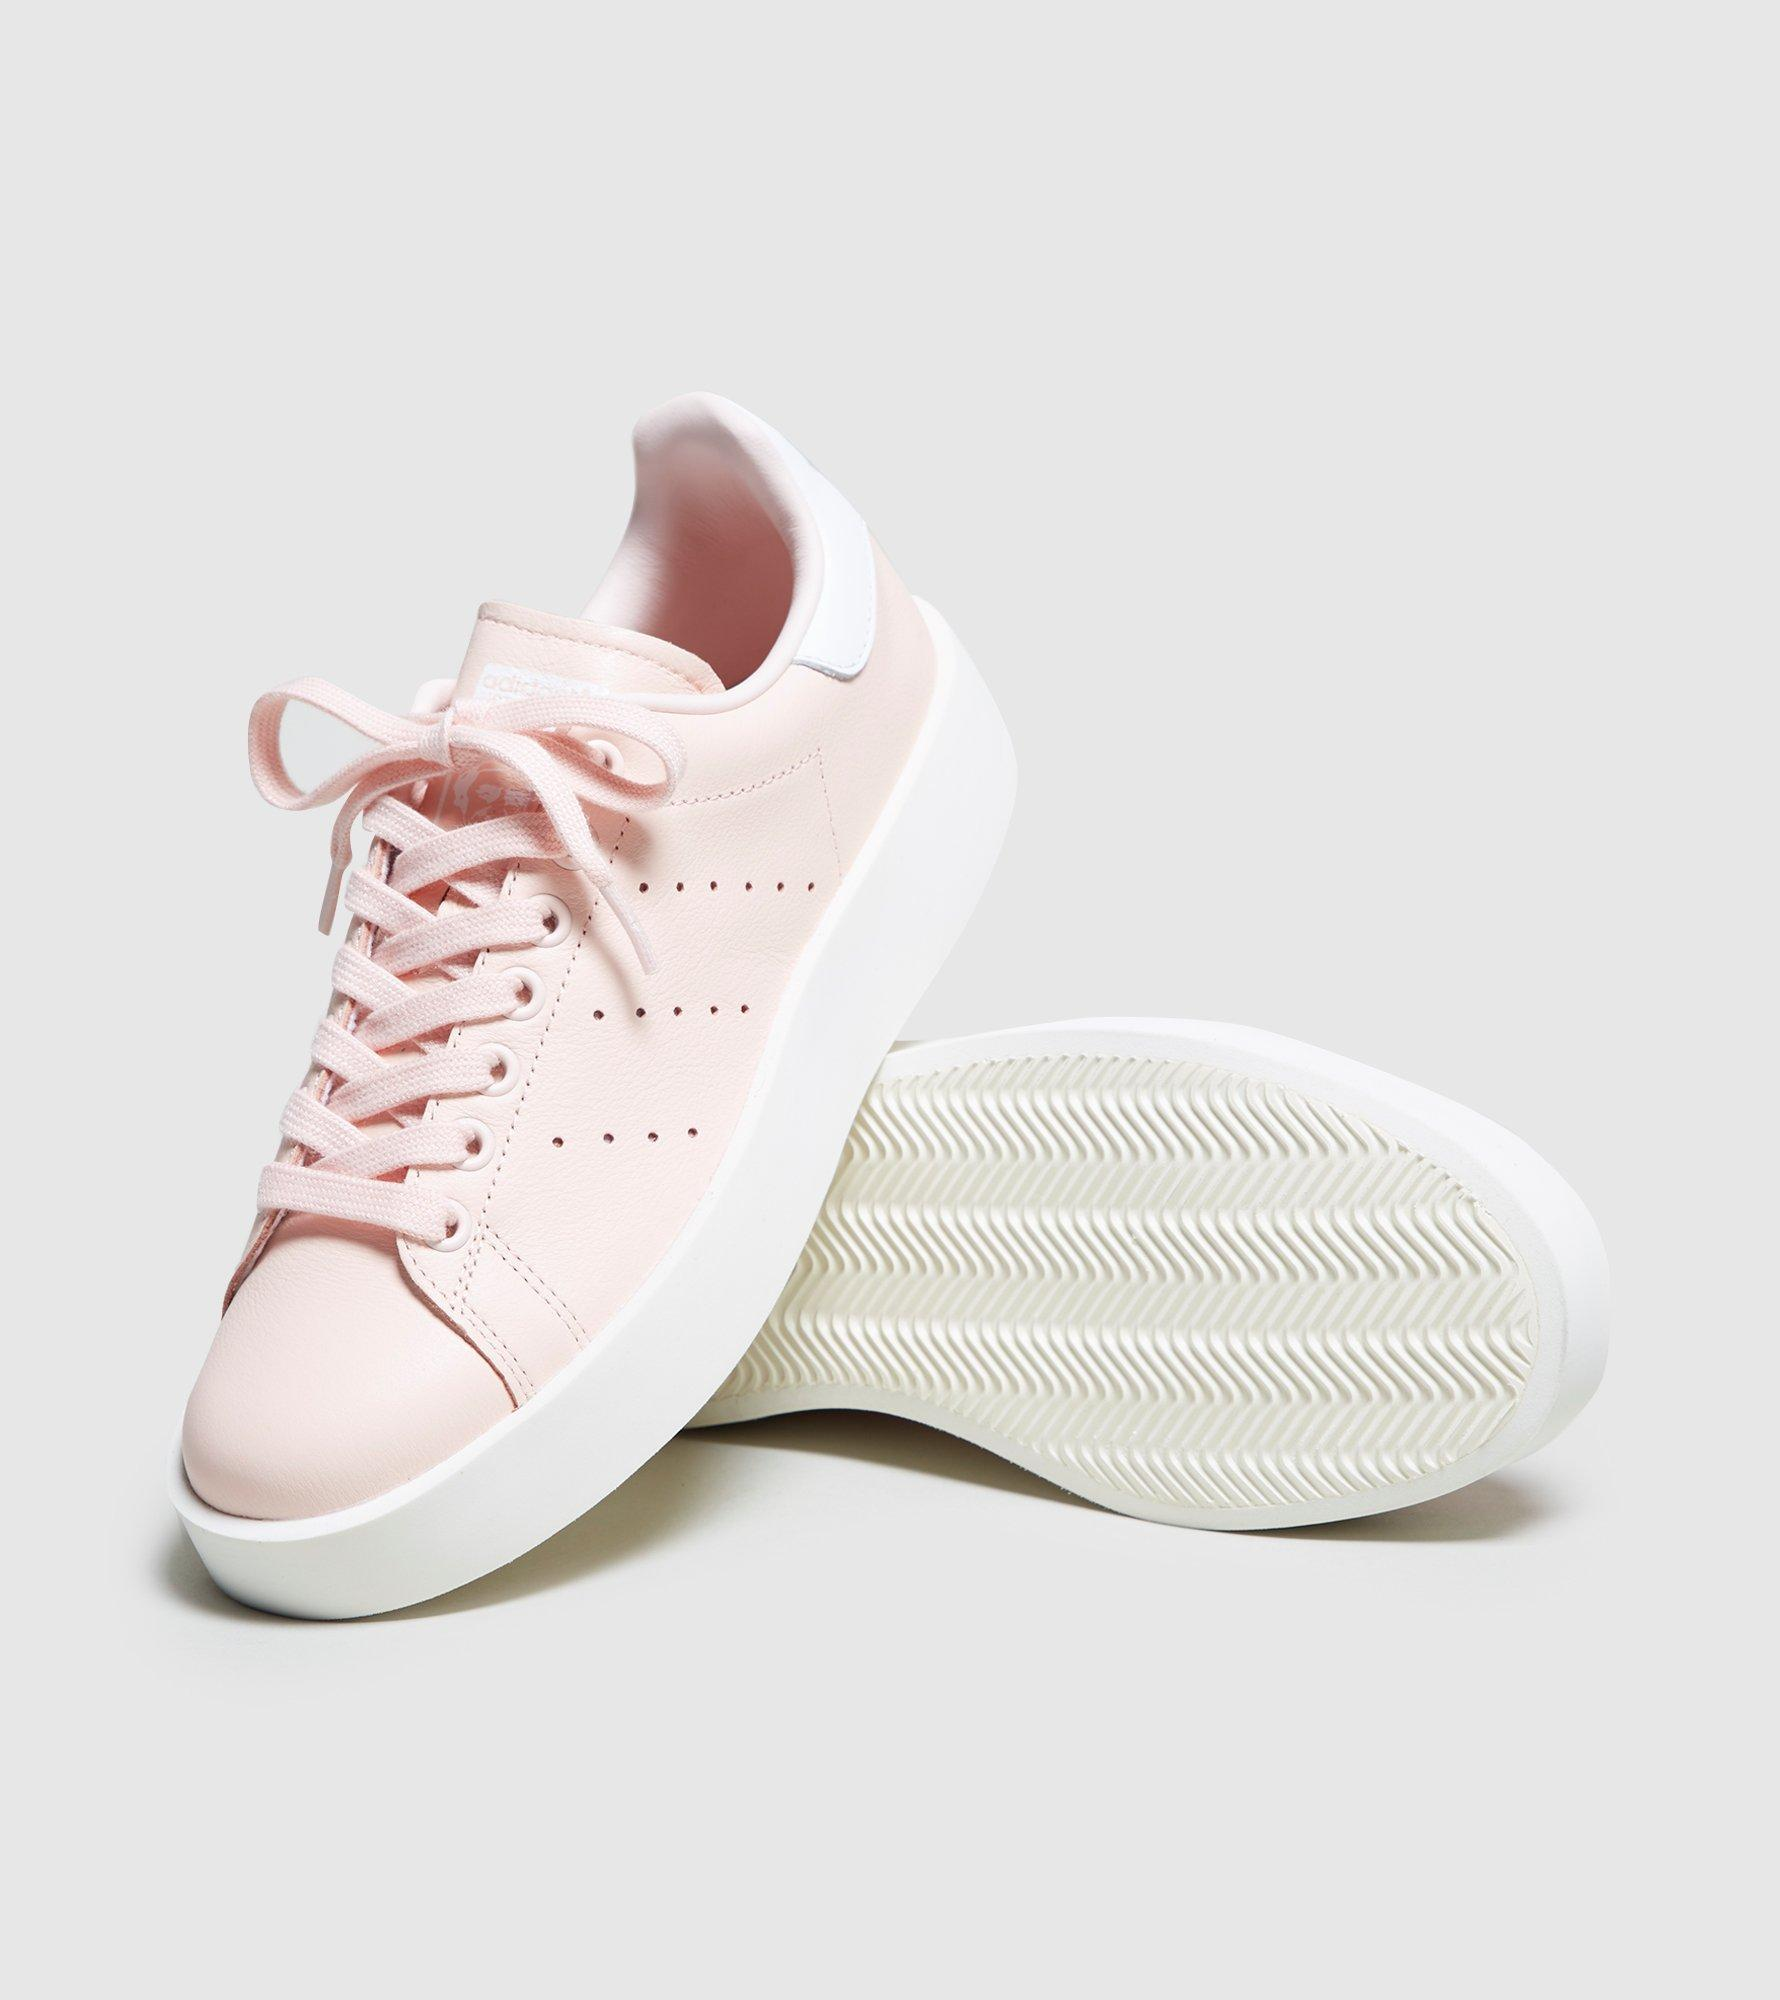 lyst adidas originali stan smith audace donne in rosa